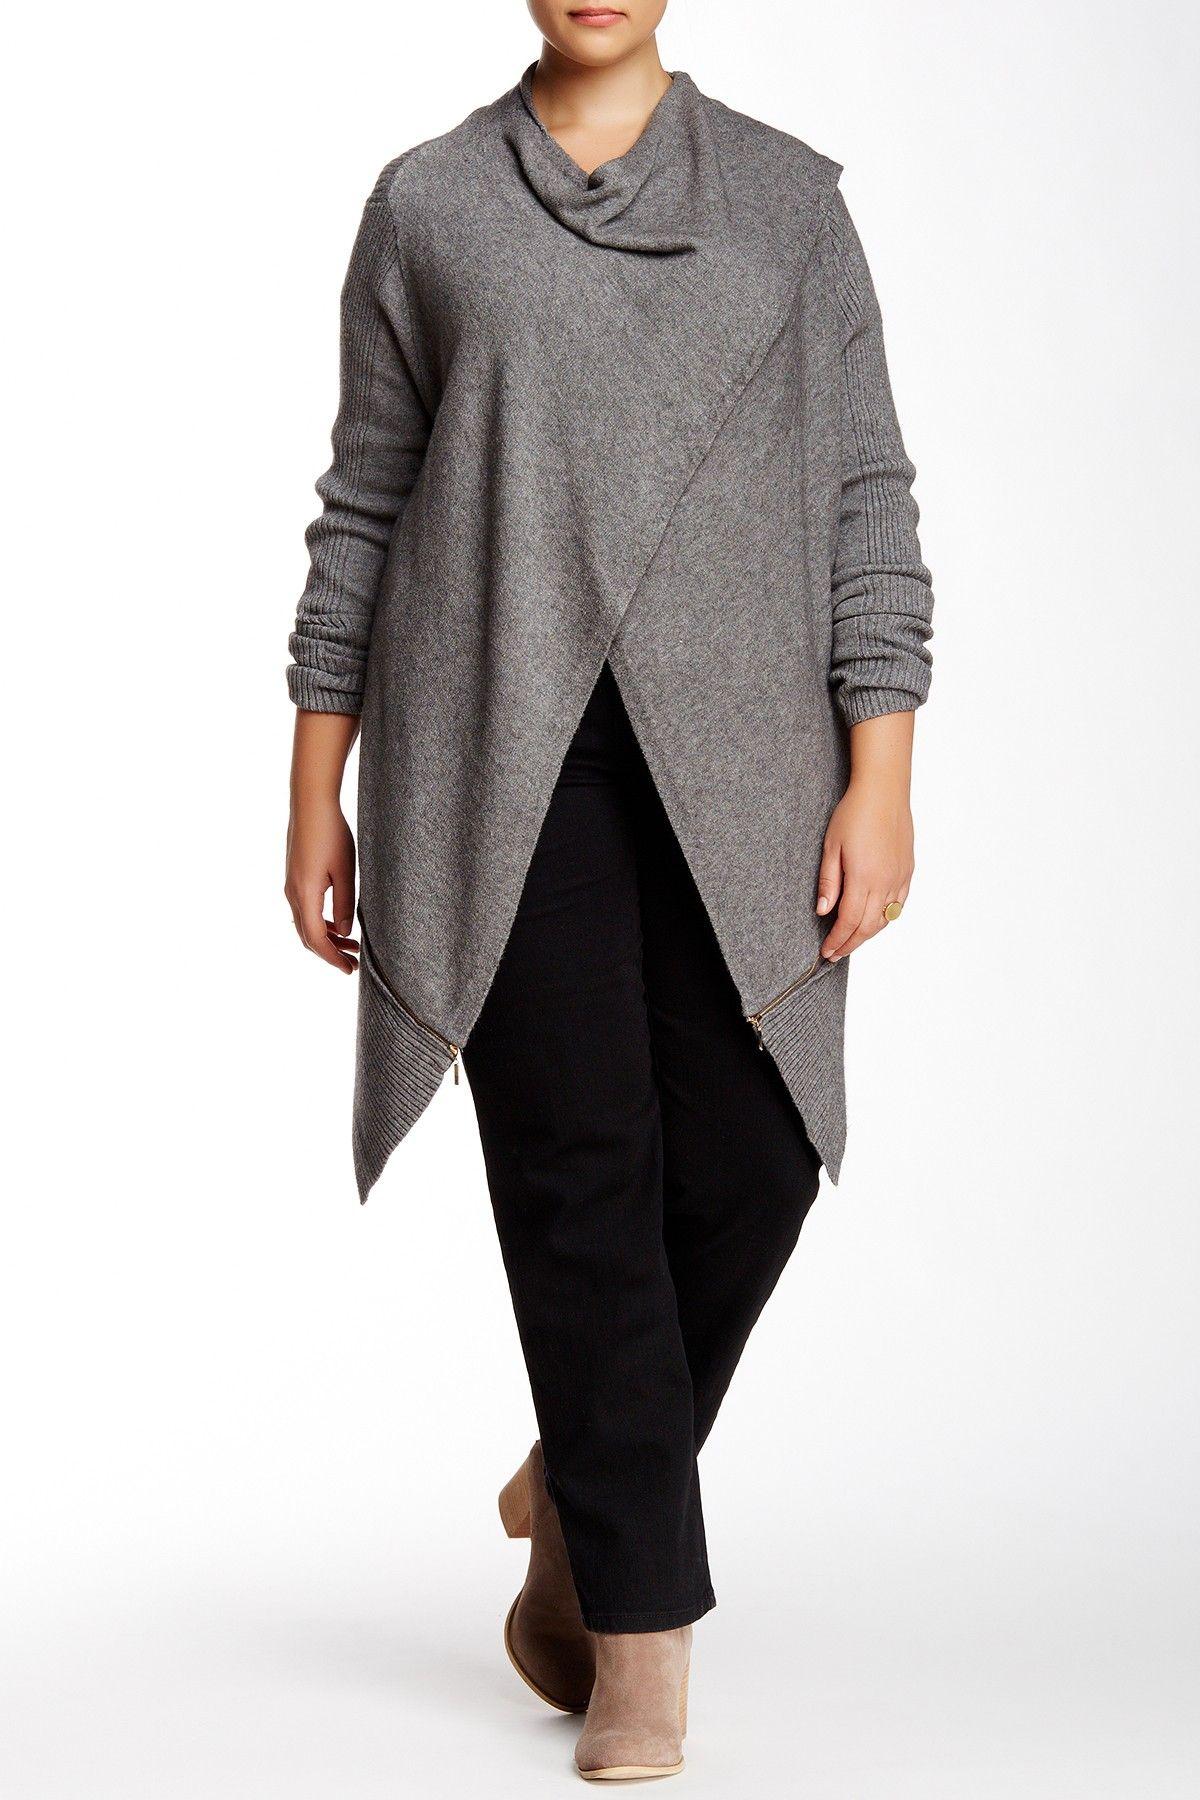 Zip Trim Wrap Cardigan (Plus Size) by Love Token on @nordstrom_rack